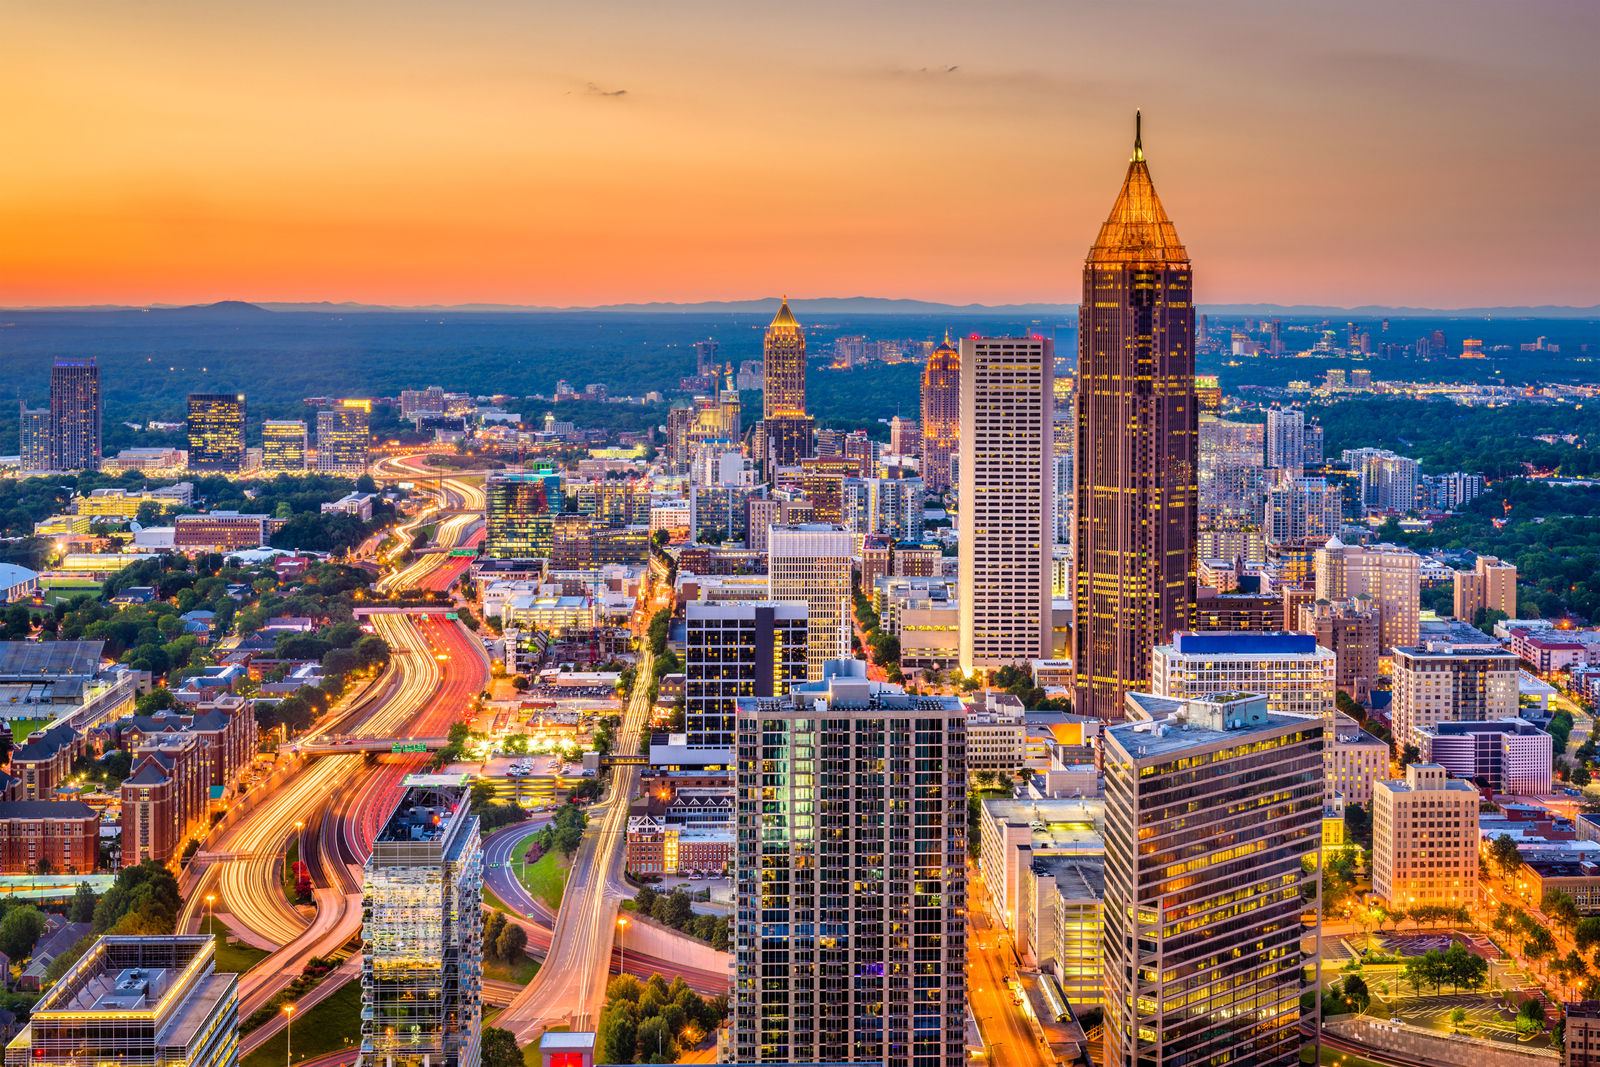 Atlanta, Georgia comes in at No. 17 on the list. (Thinkstock)